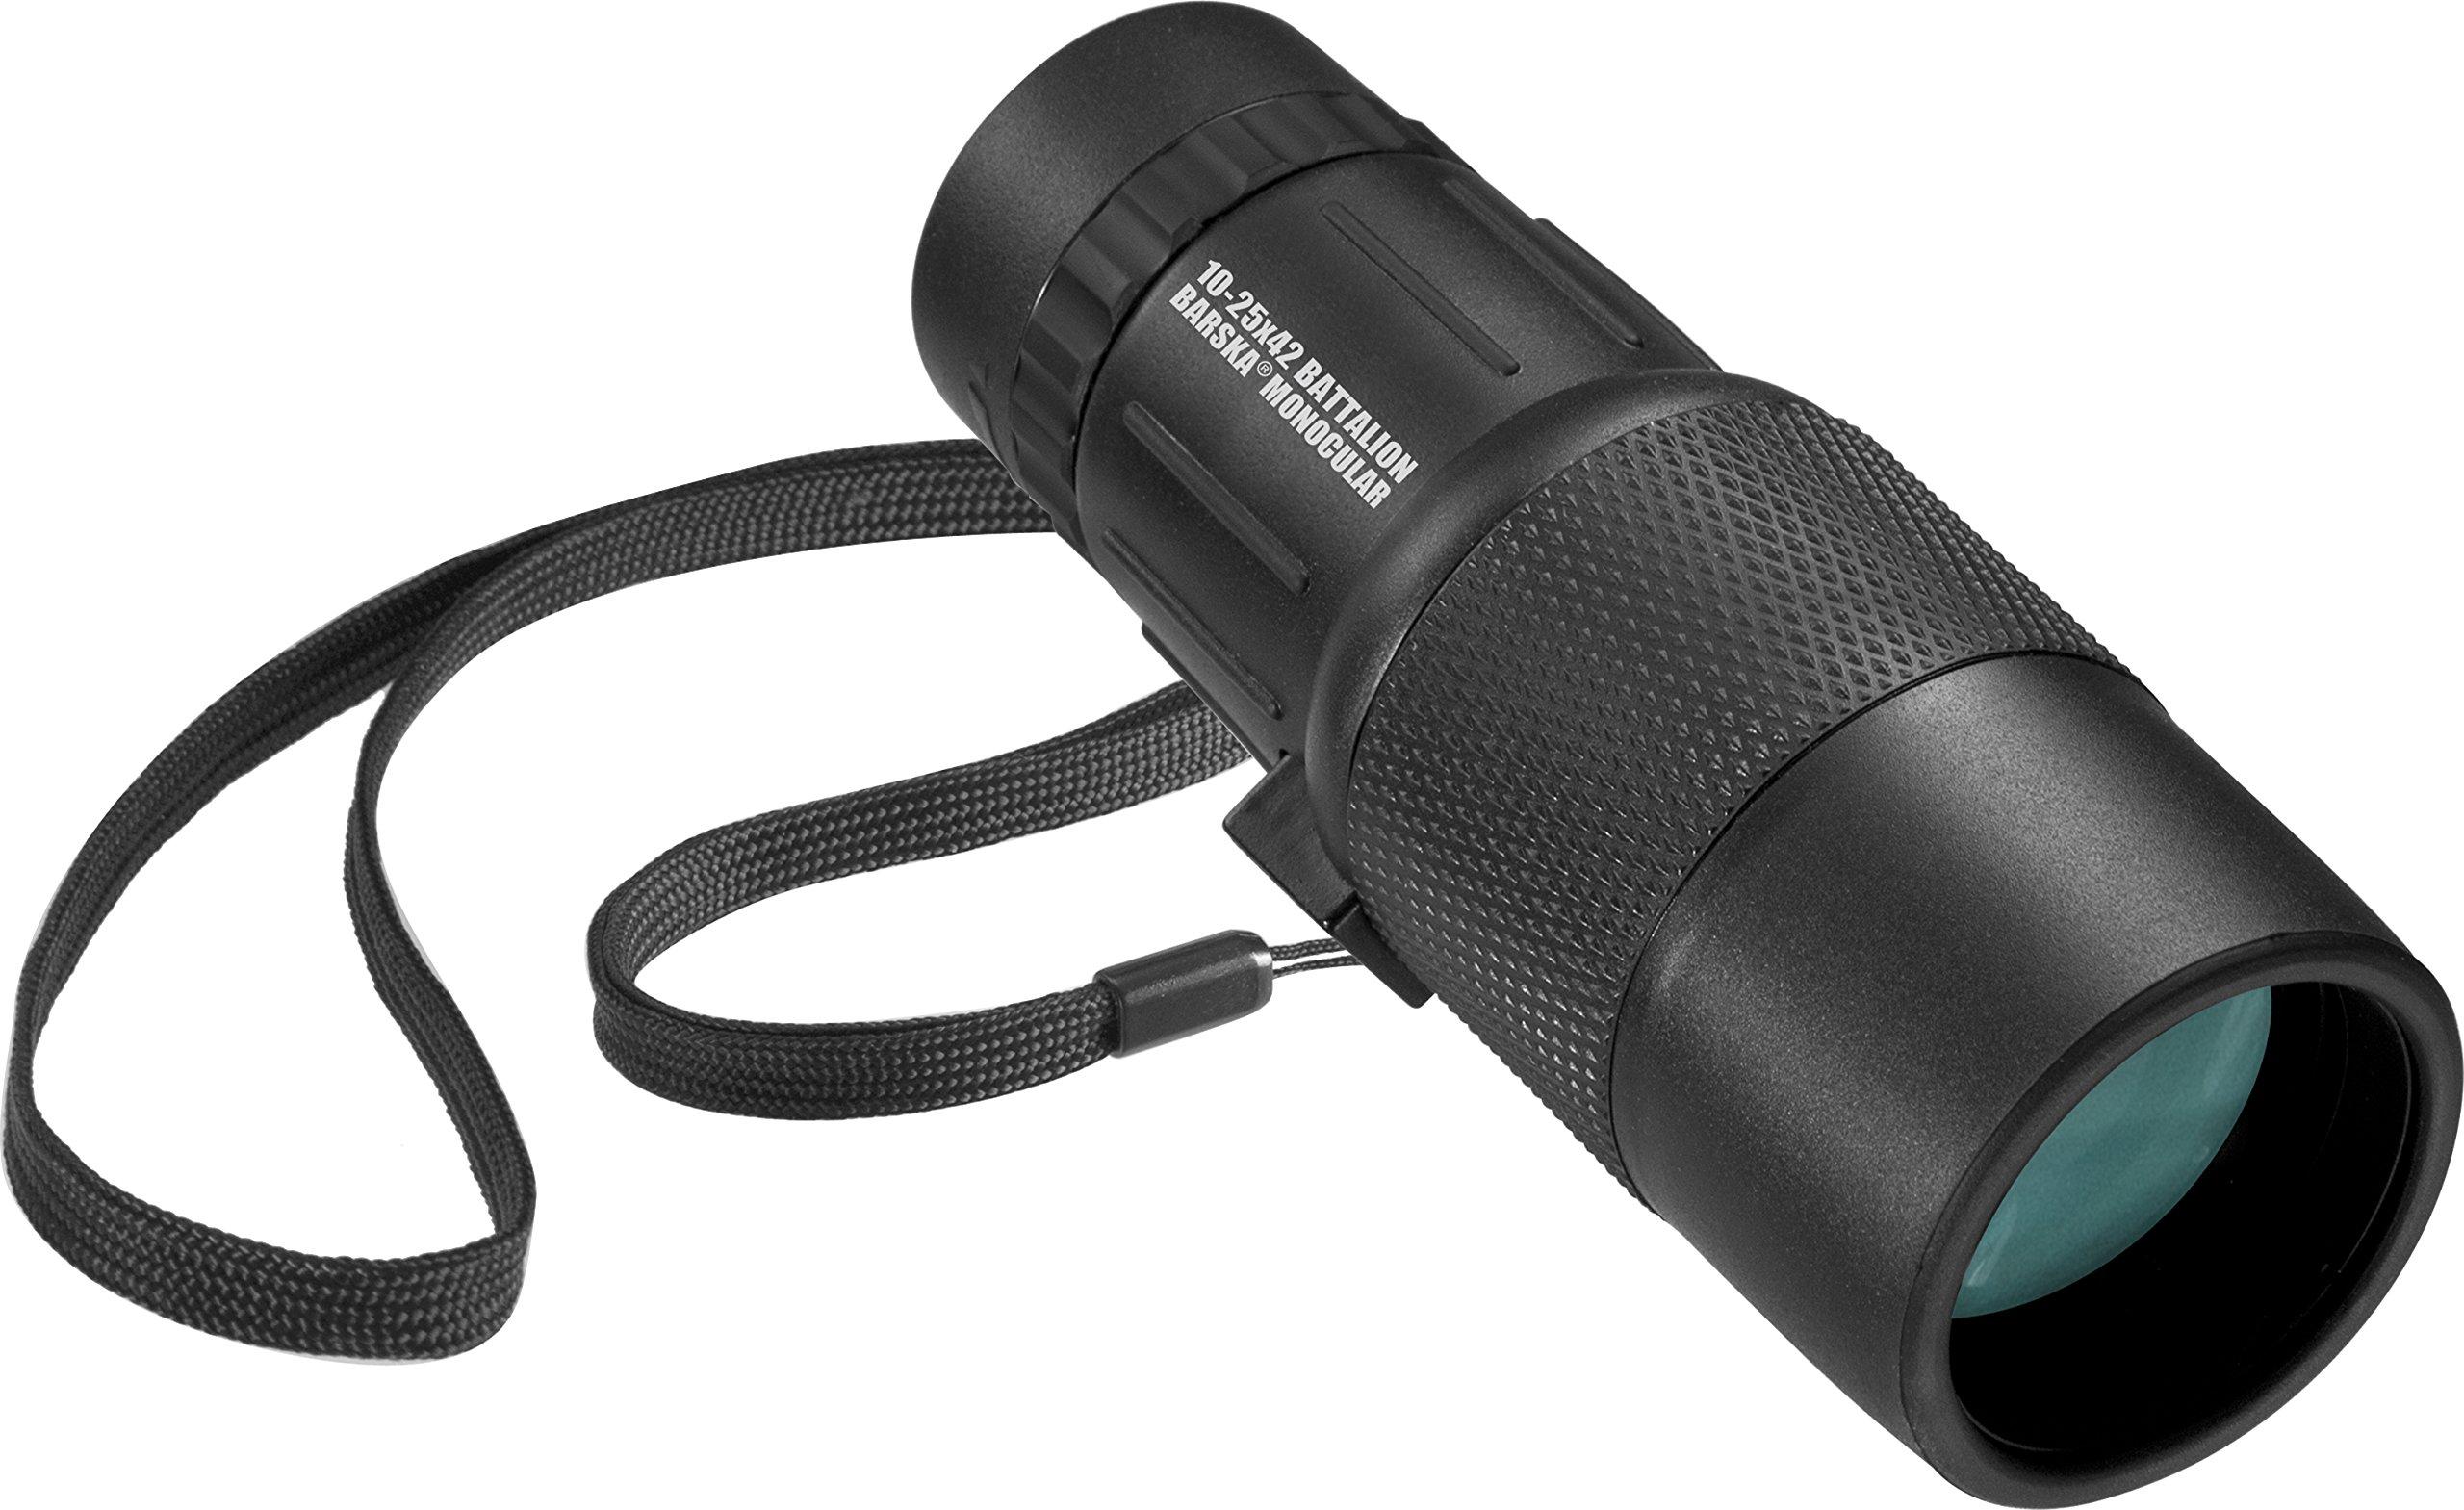 BARSKA New 10-25x42 mm Waterproof Fogproof Monocular Scope for Bird Watching/Hunting/Camping/Hiking/Golf/Concert/Surveillance by BARSKA